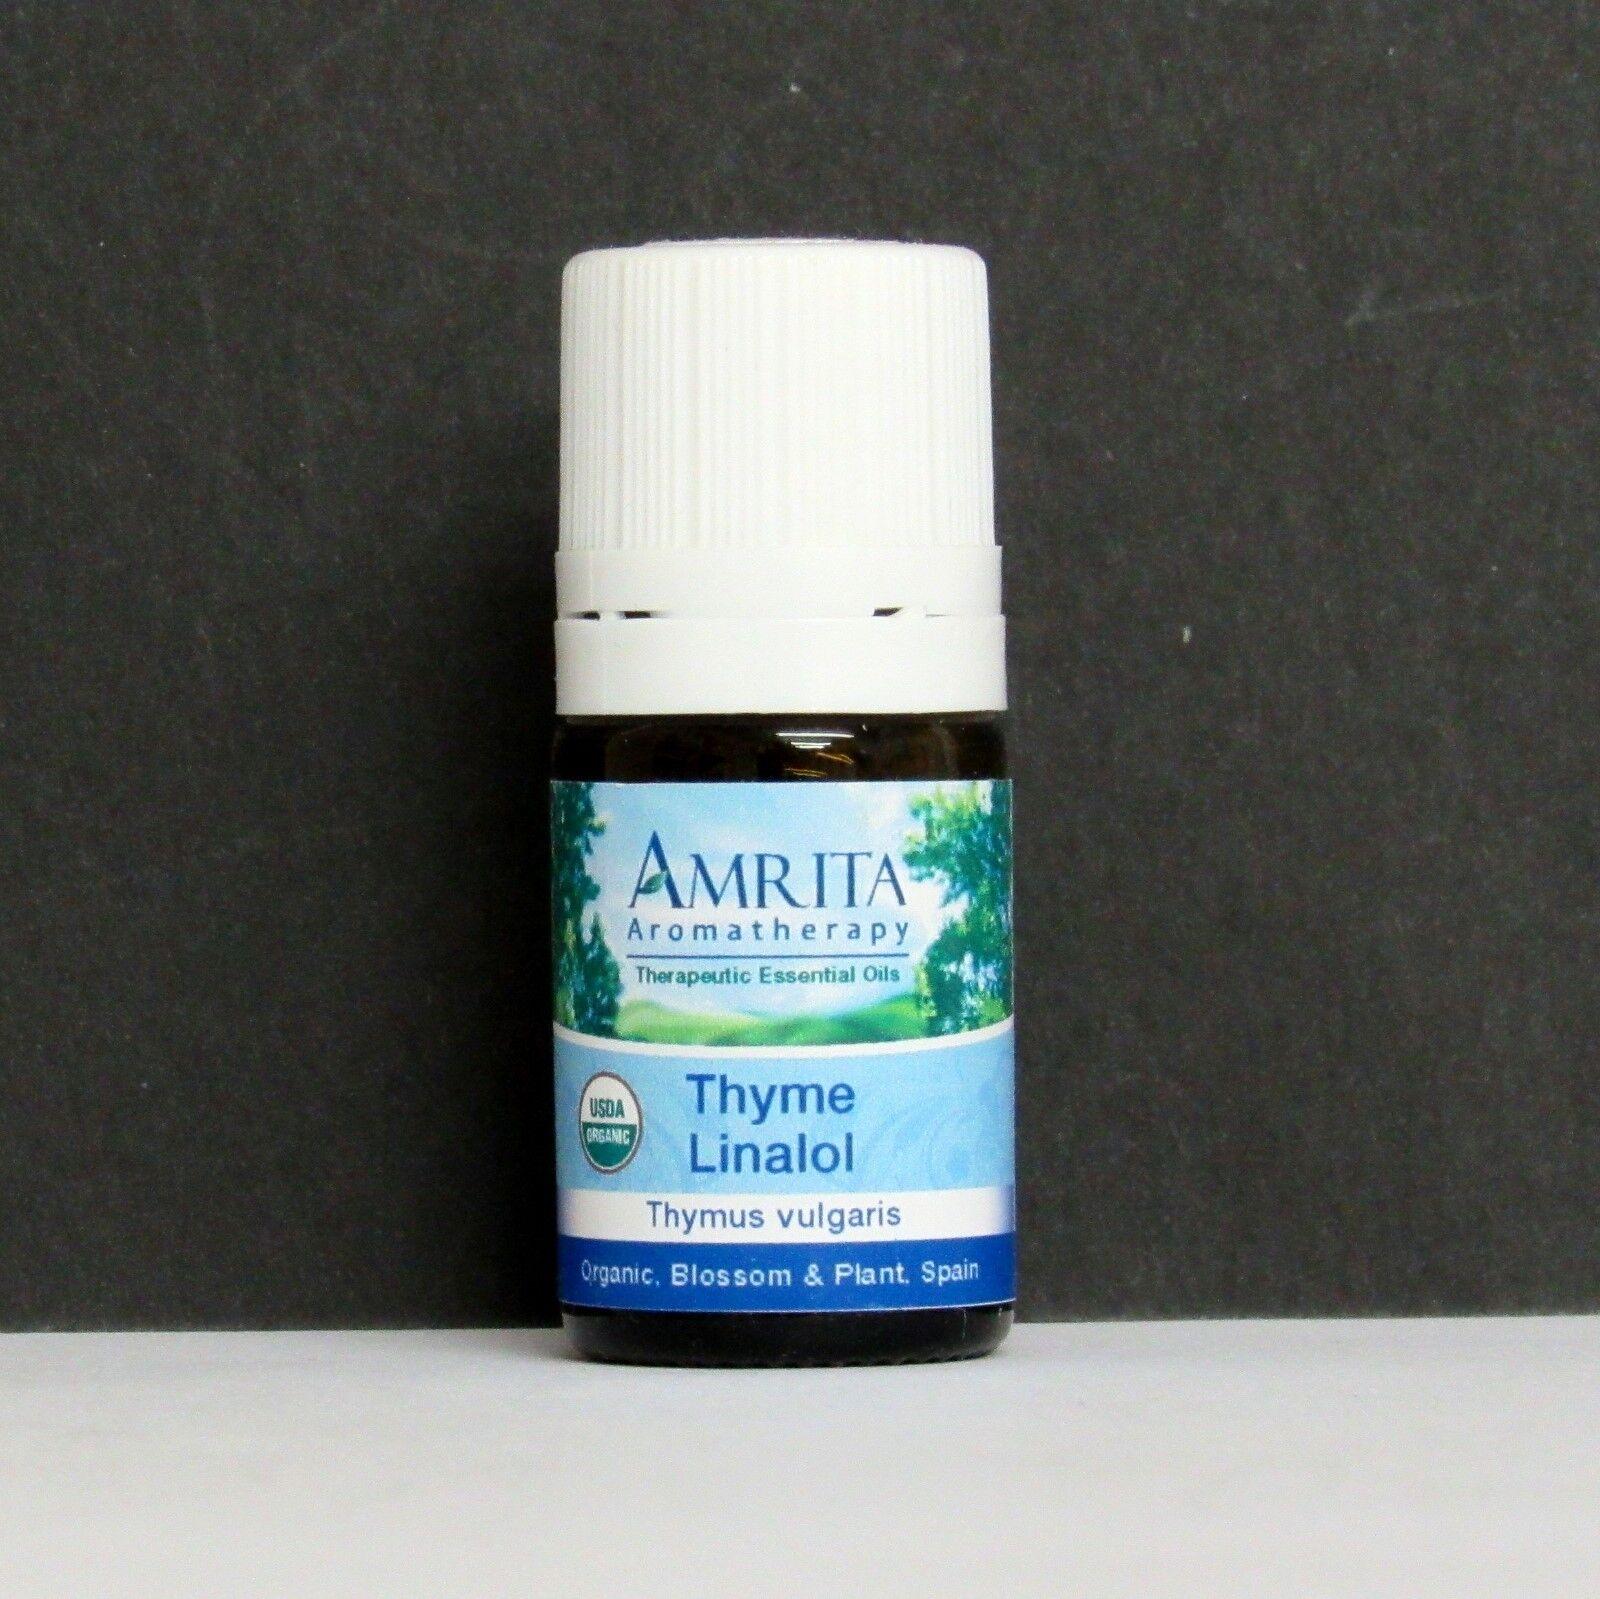 CLOSEOUT Amrita Essential Oil Thyme Linalol 5 ml Organic Blo